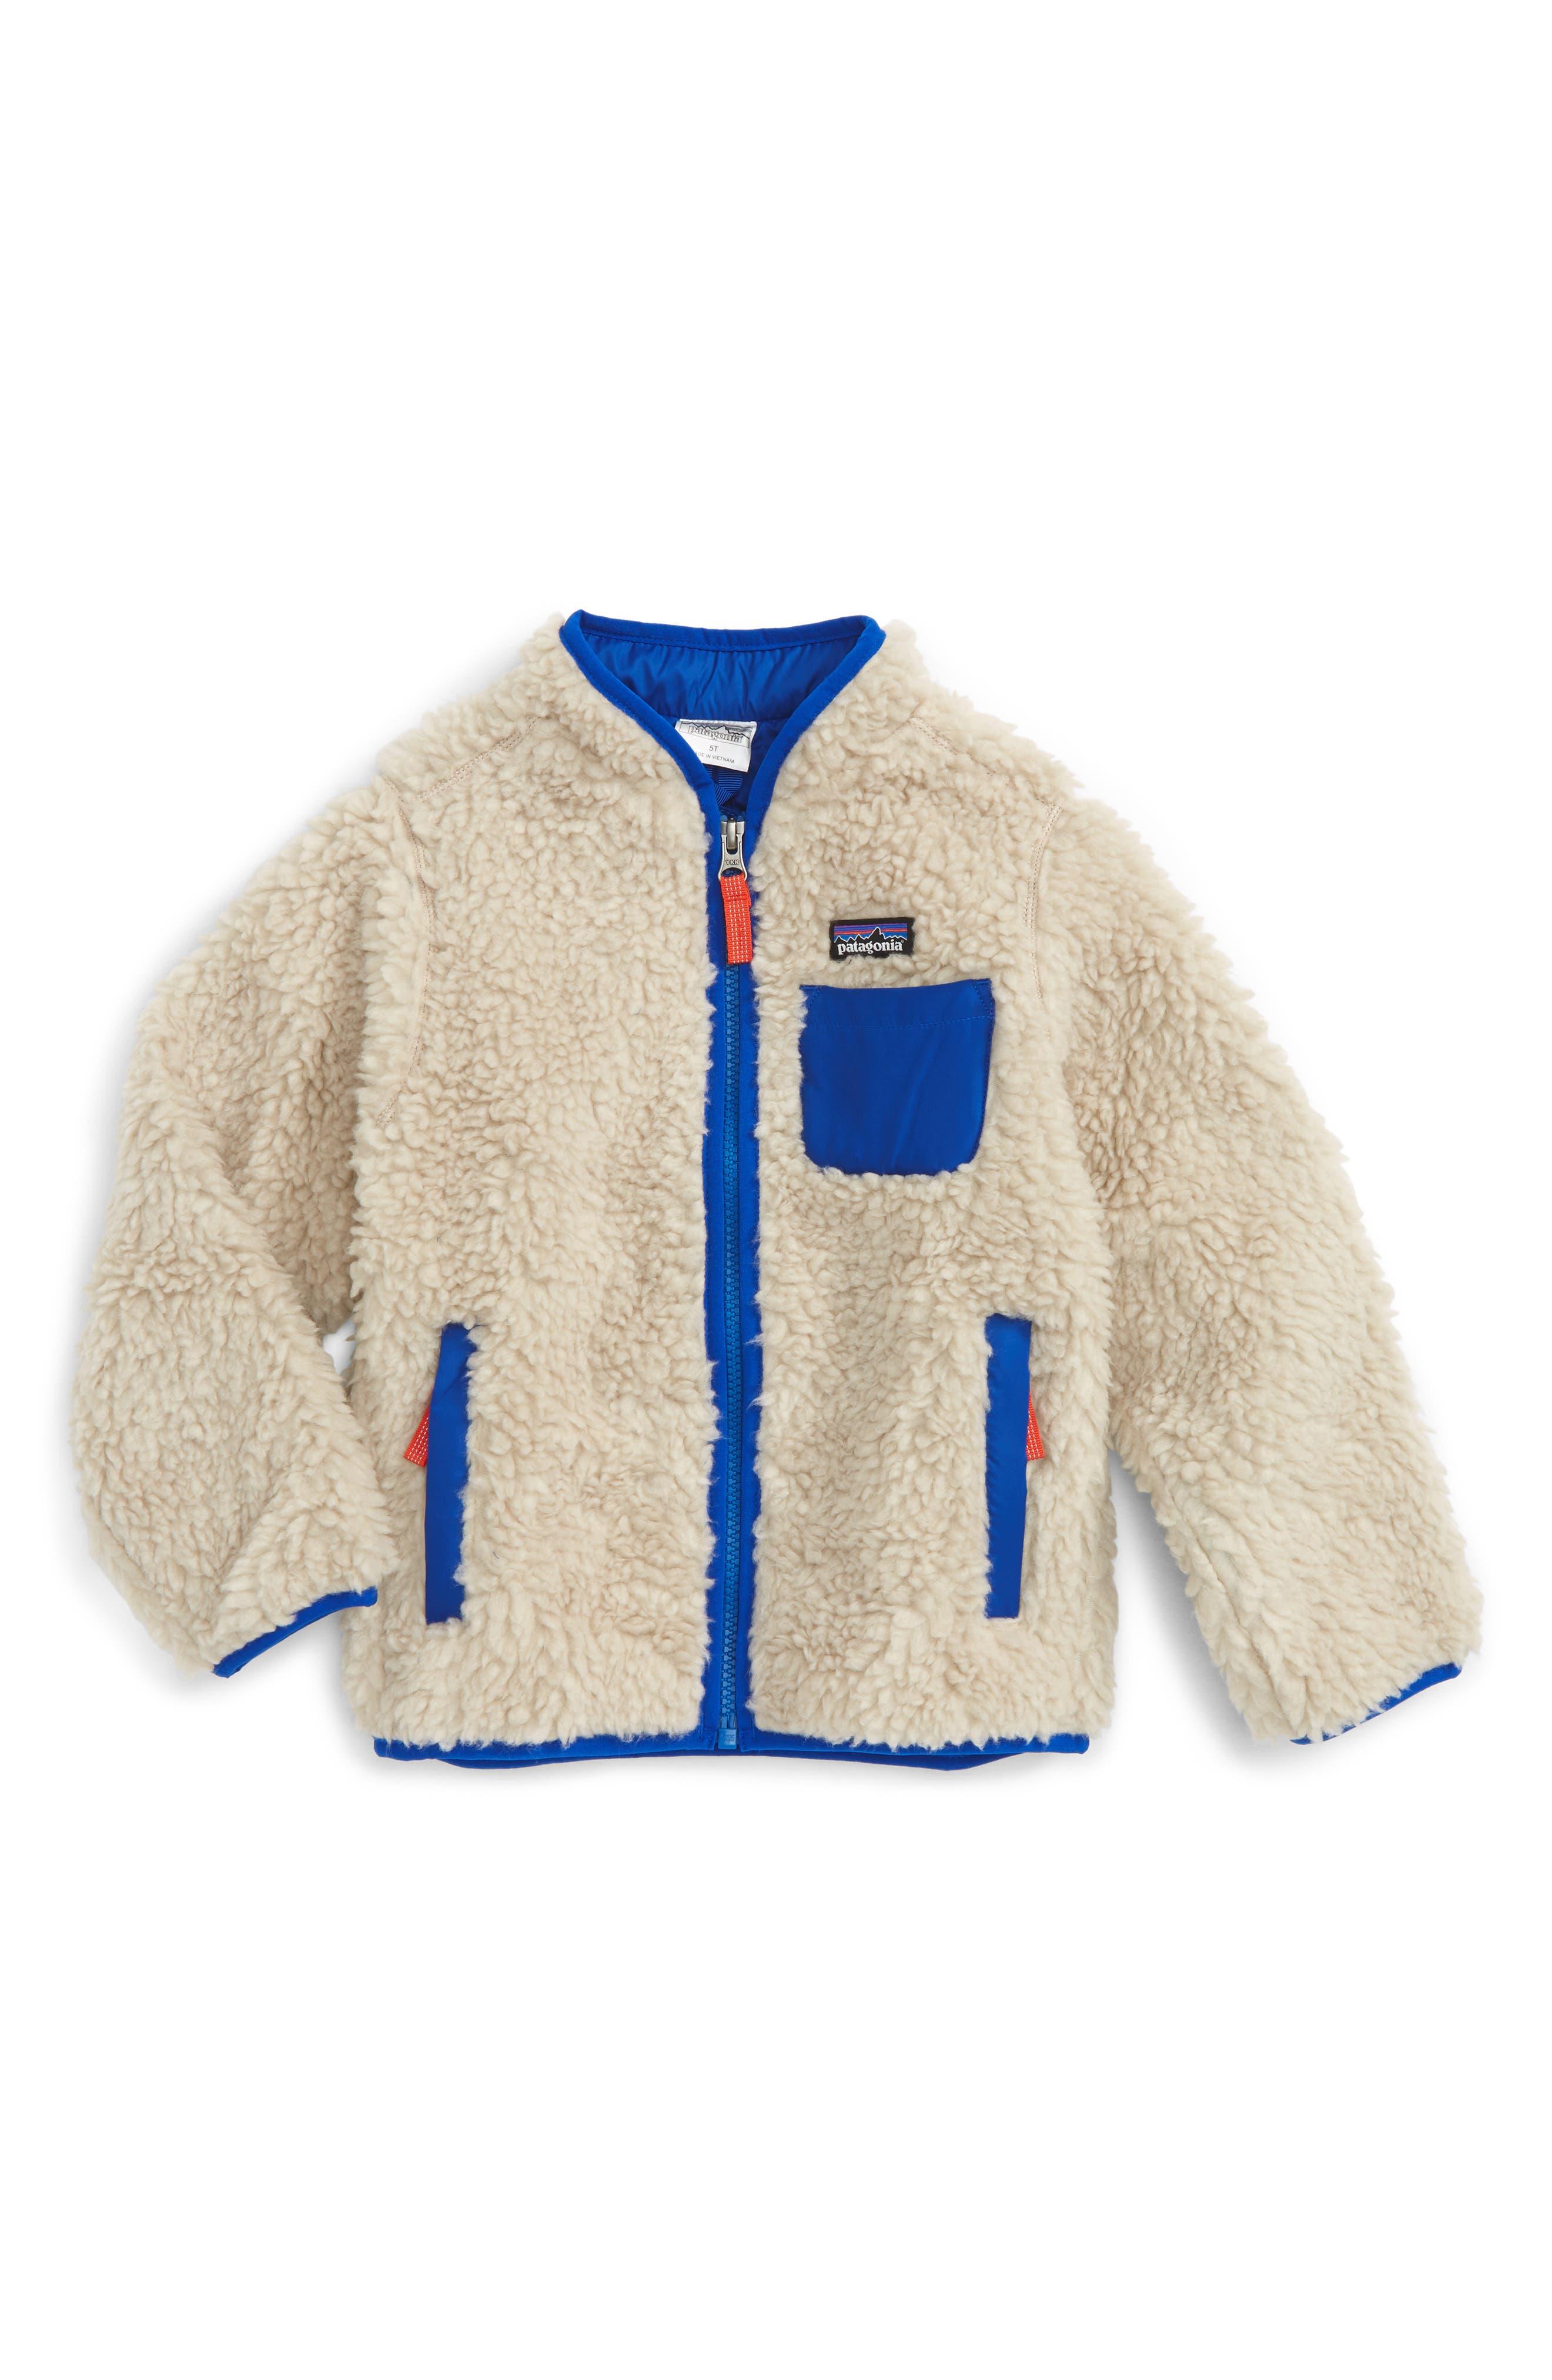 PATAGONIA Retro-X Windproof Fleece Jacket, Main, color, 257